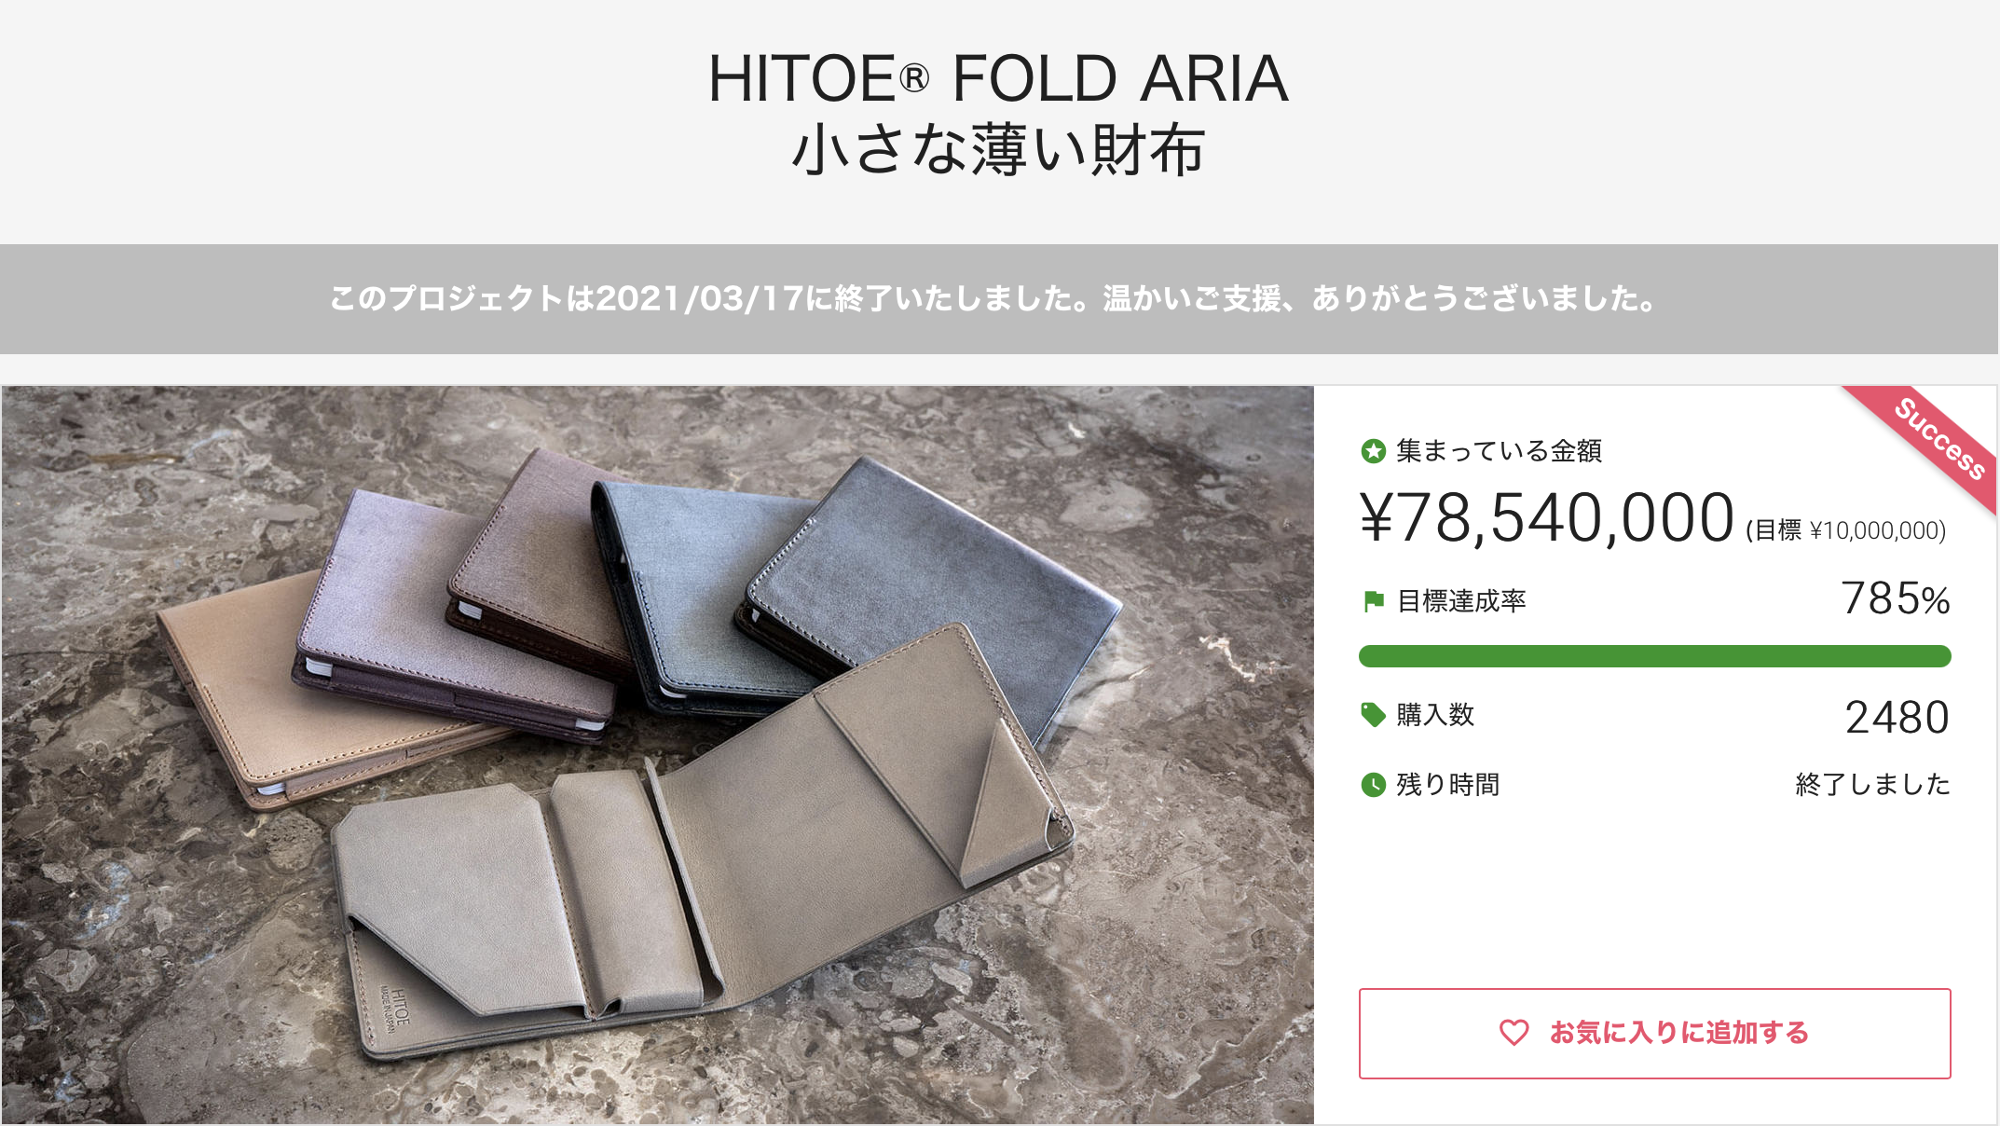 HITOE Fold Aria-Foschia-